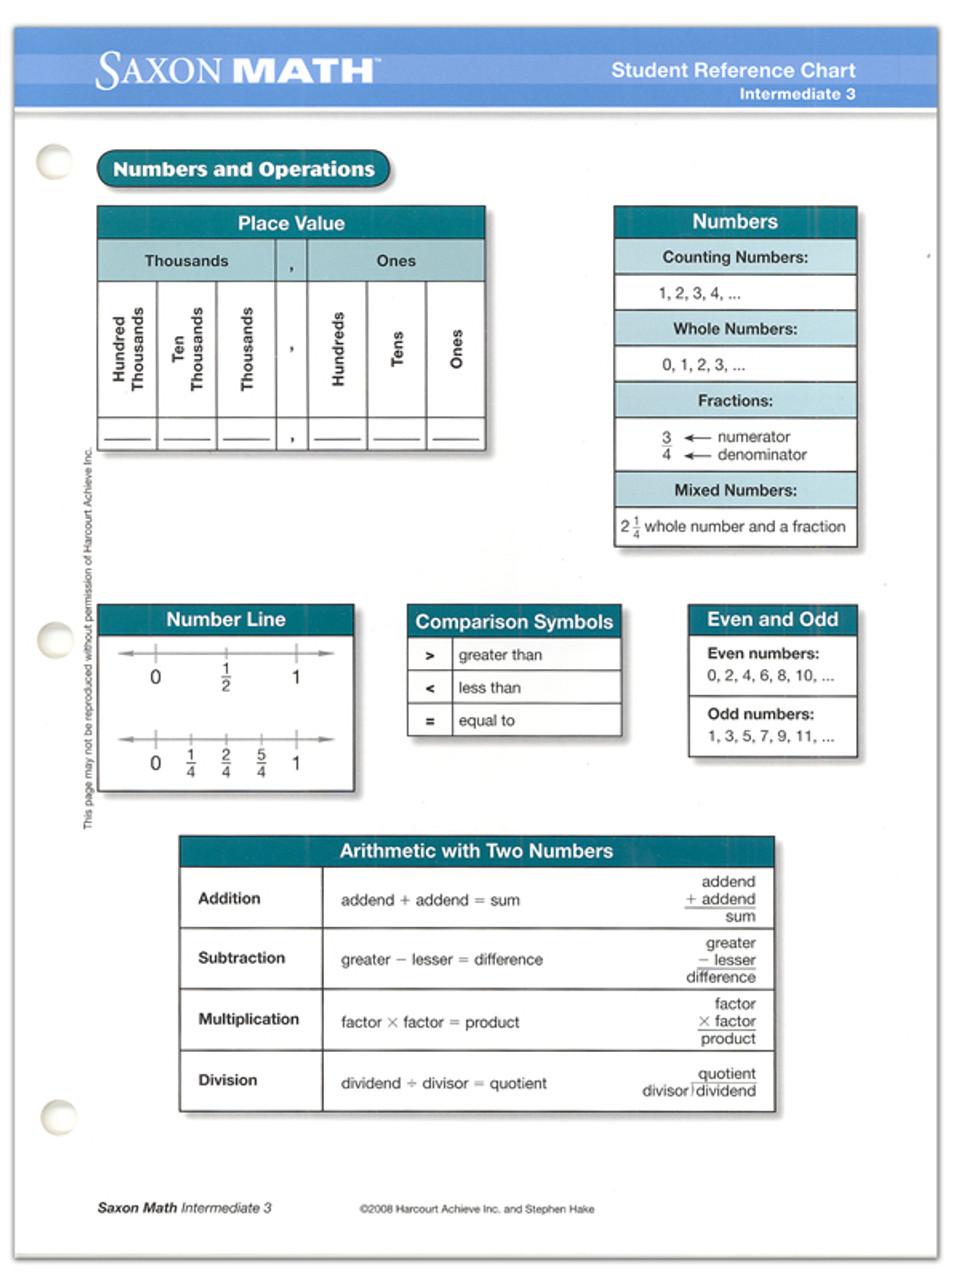 hight resolution of Saxon Math Grade 3 Intermediate Student Reference Chart - Classroom  Resource Center